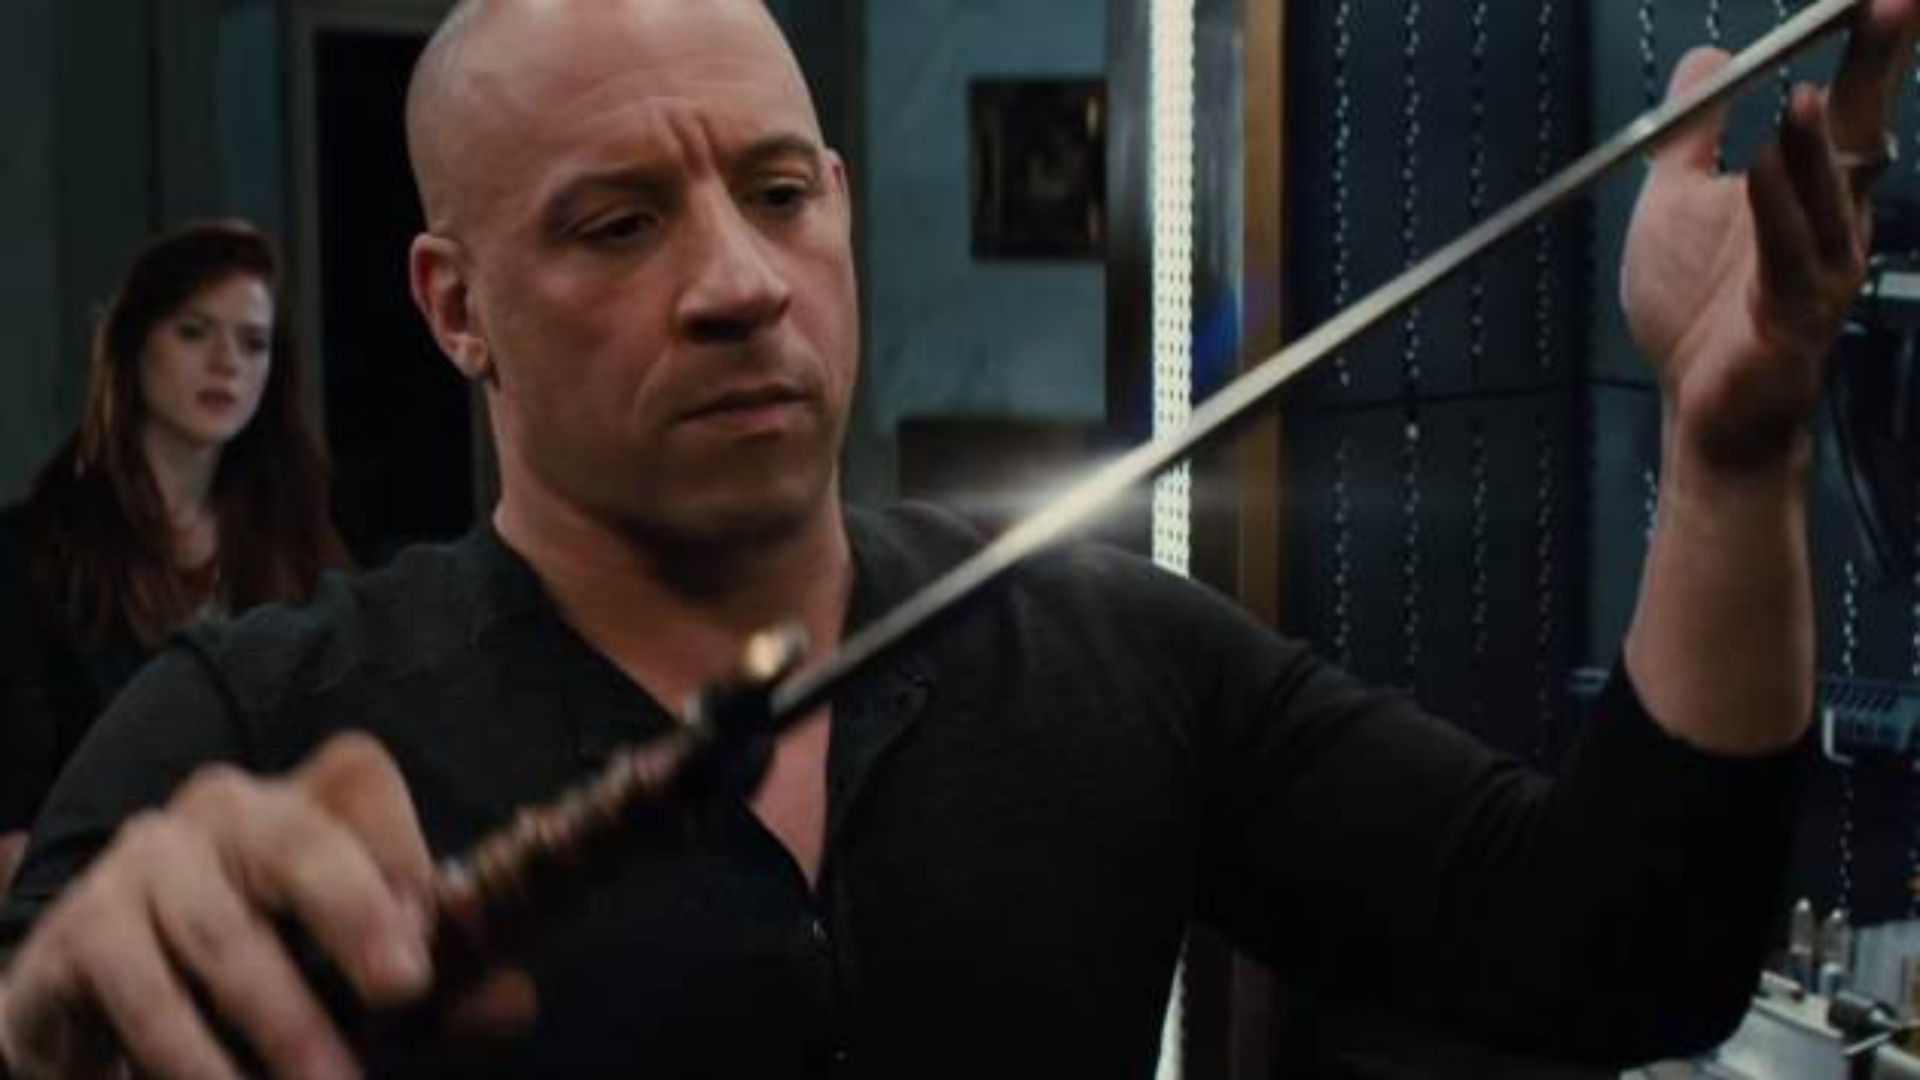 Vin-Diesel-The-Last-Witch-Hunter